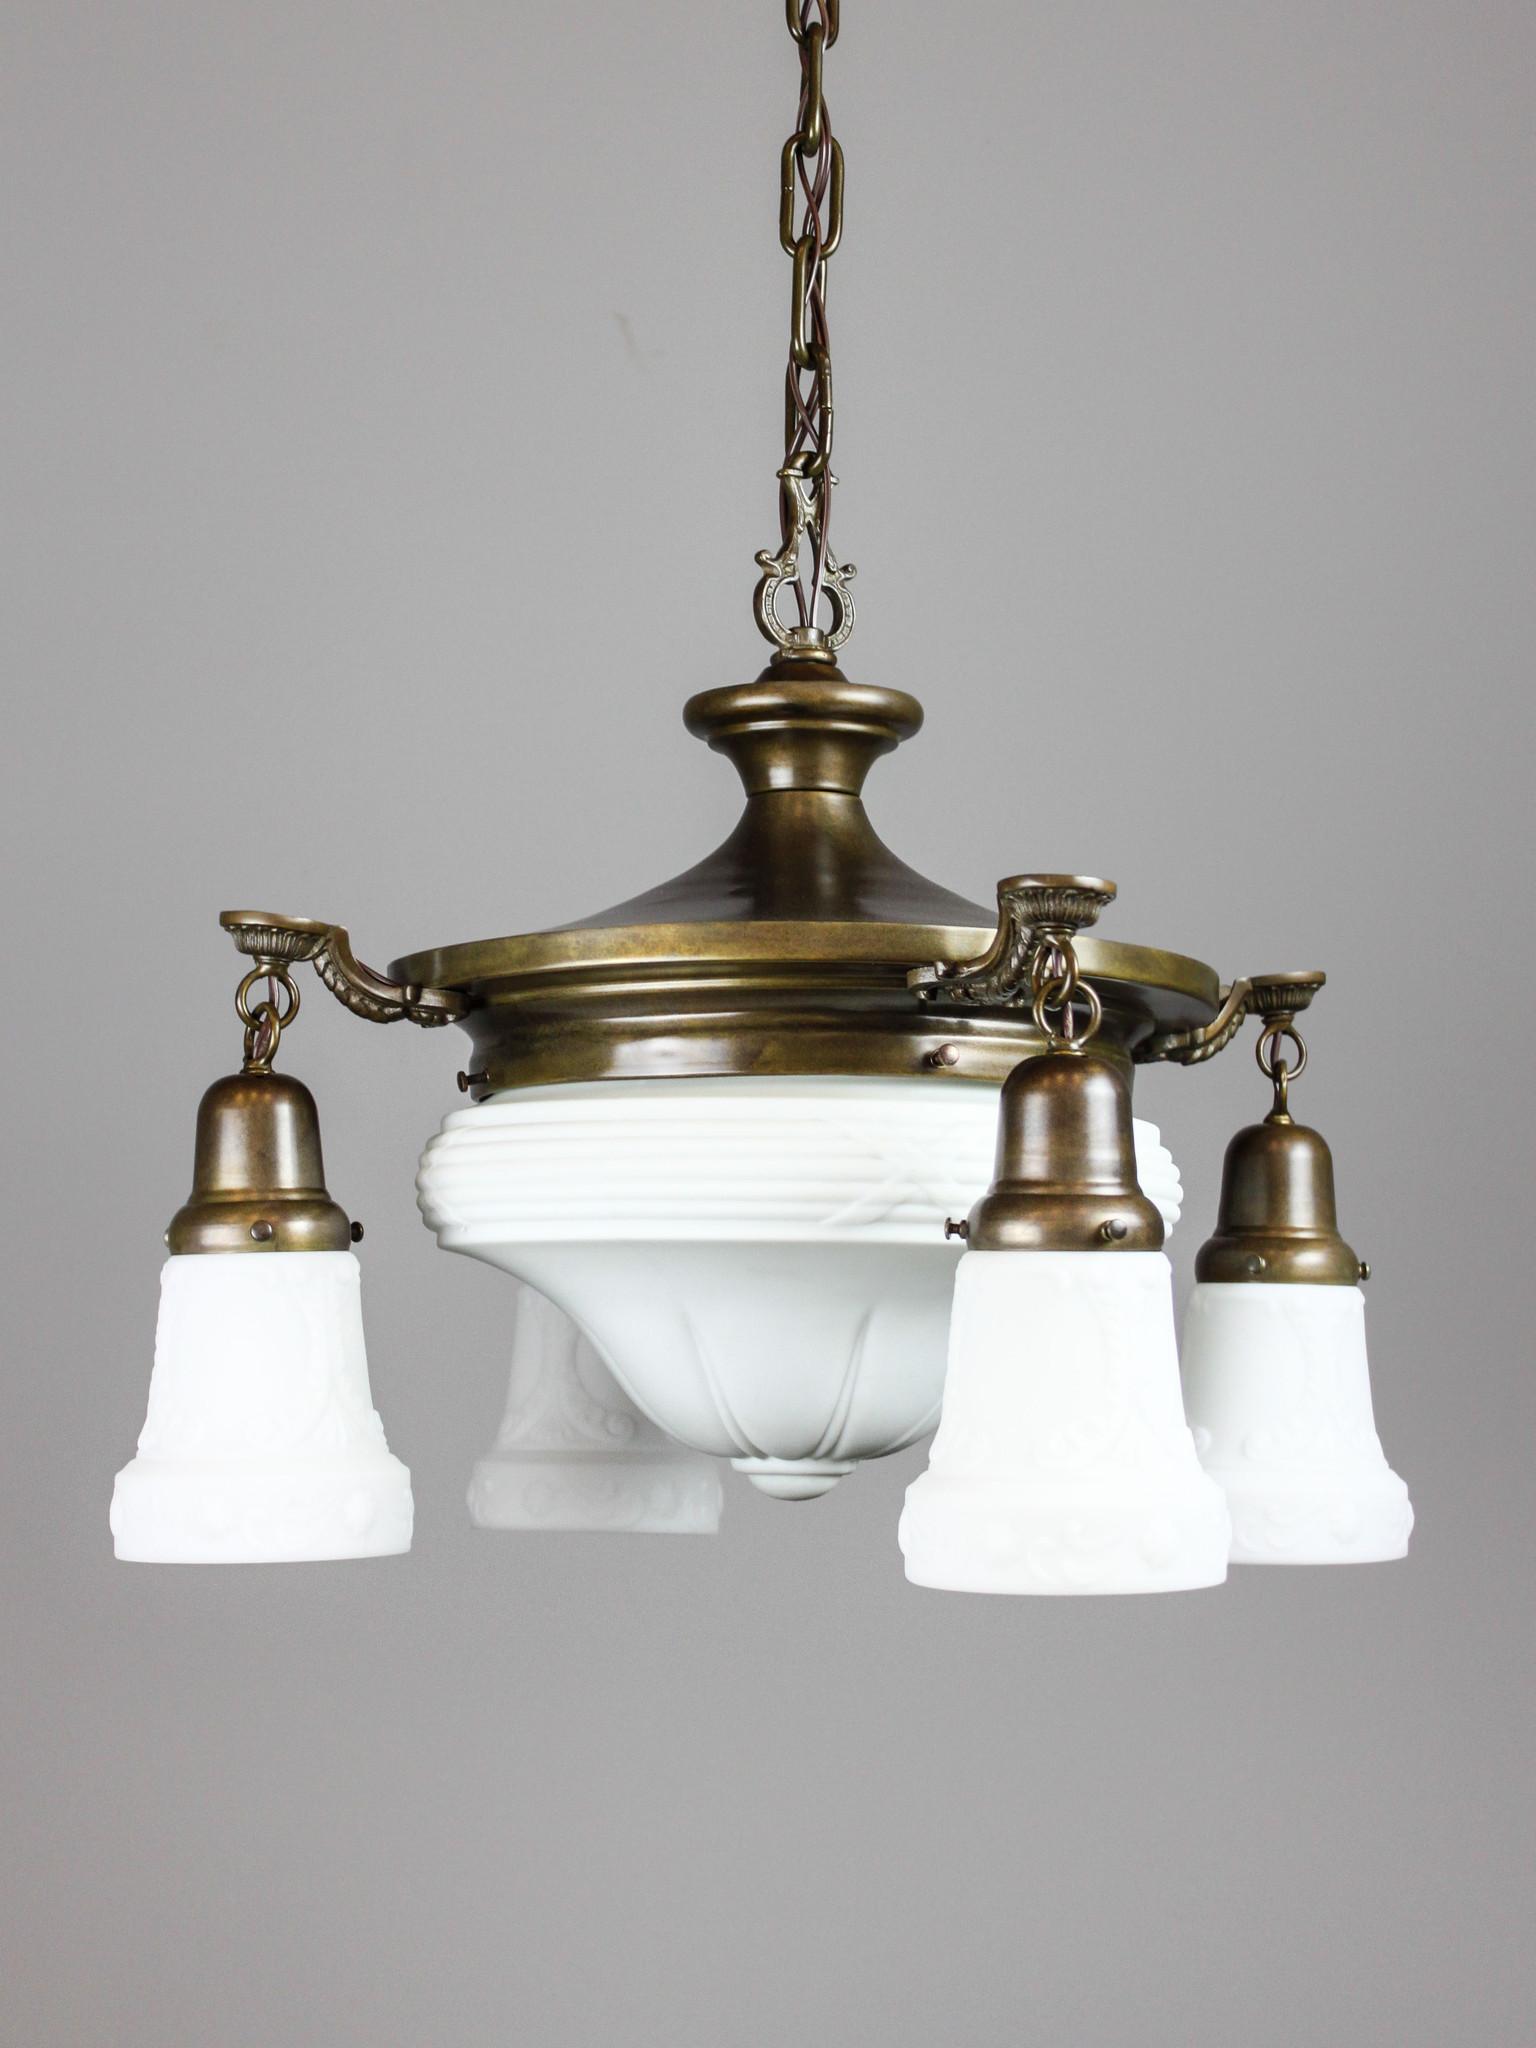 Antique Colonial Revival Pan Light Fixture 4 1 Light Renew Gallery